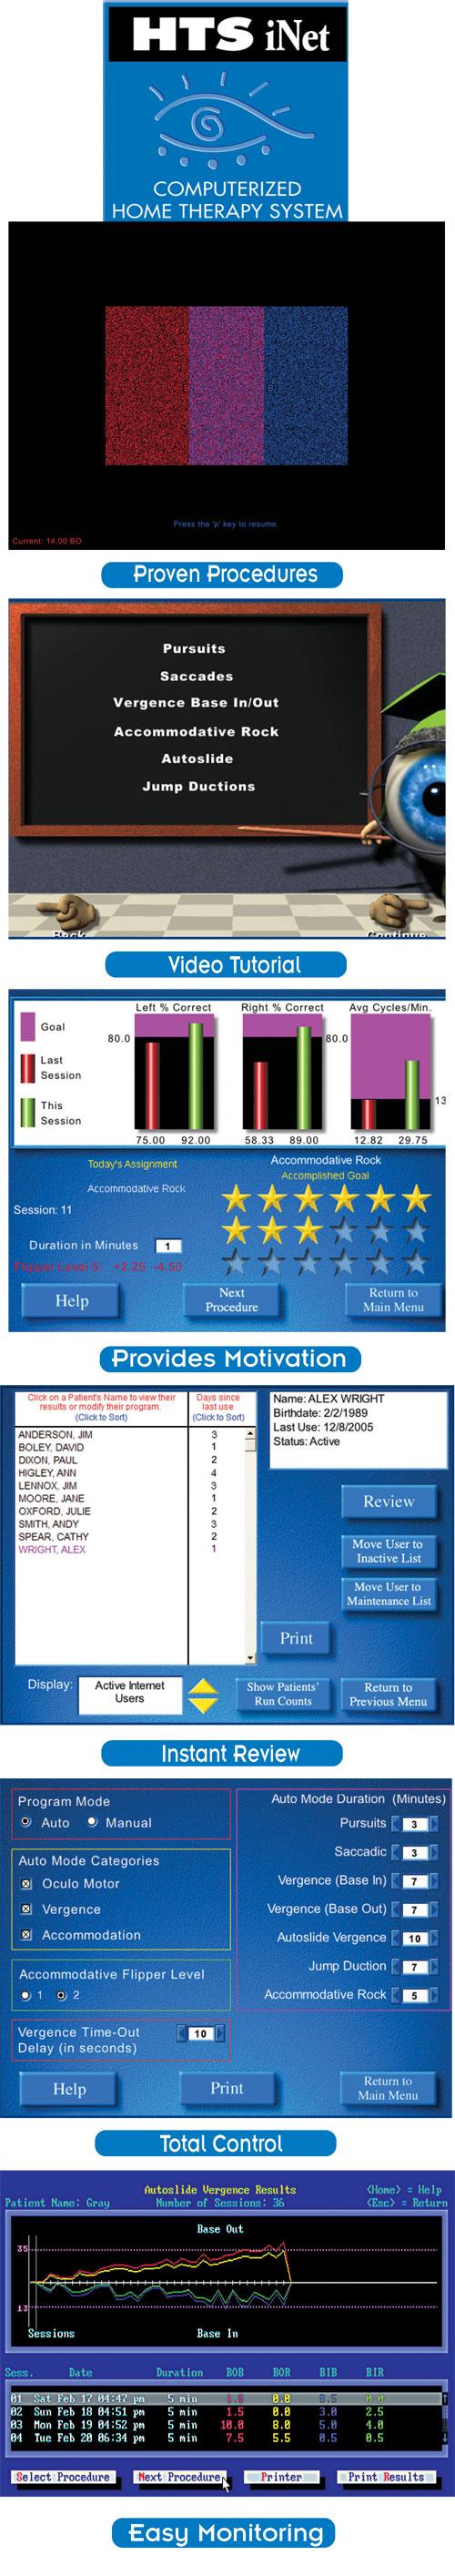 HTS iNet Program